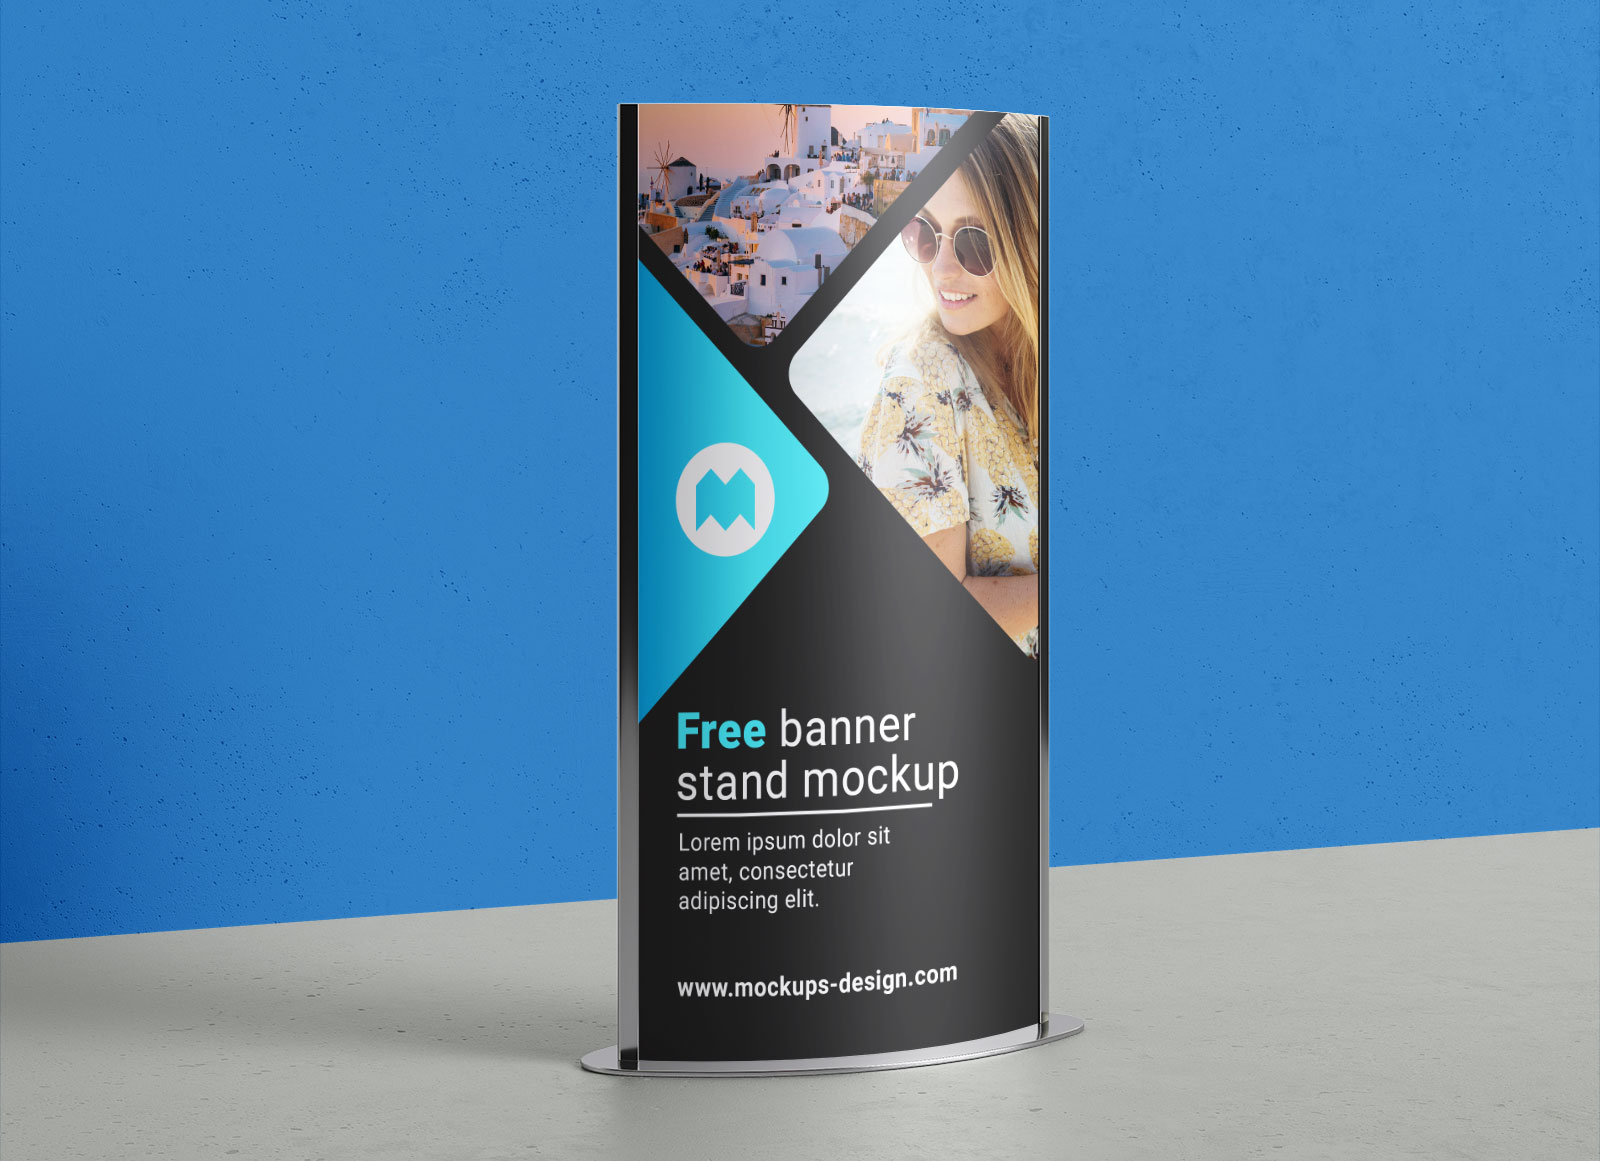 Free-Indoor-Ourdoor-Poster-Display-Stand-Mockup-PSD-File